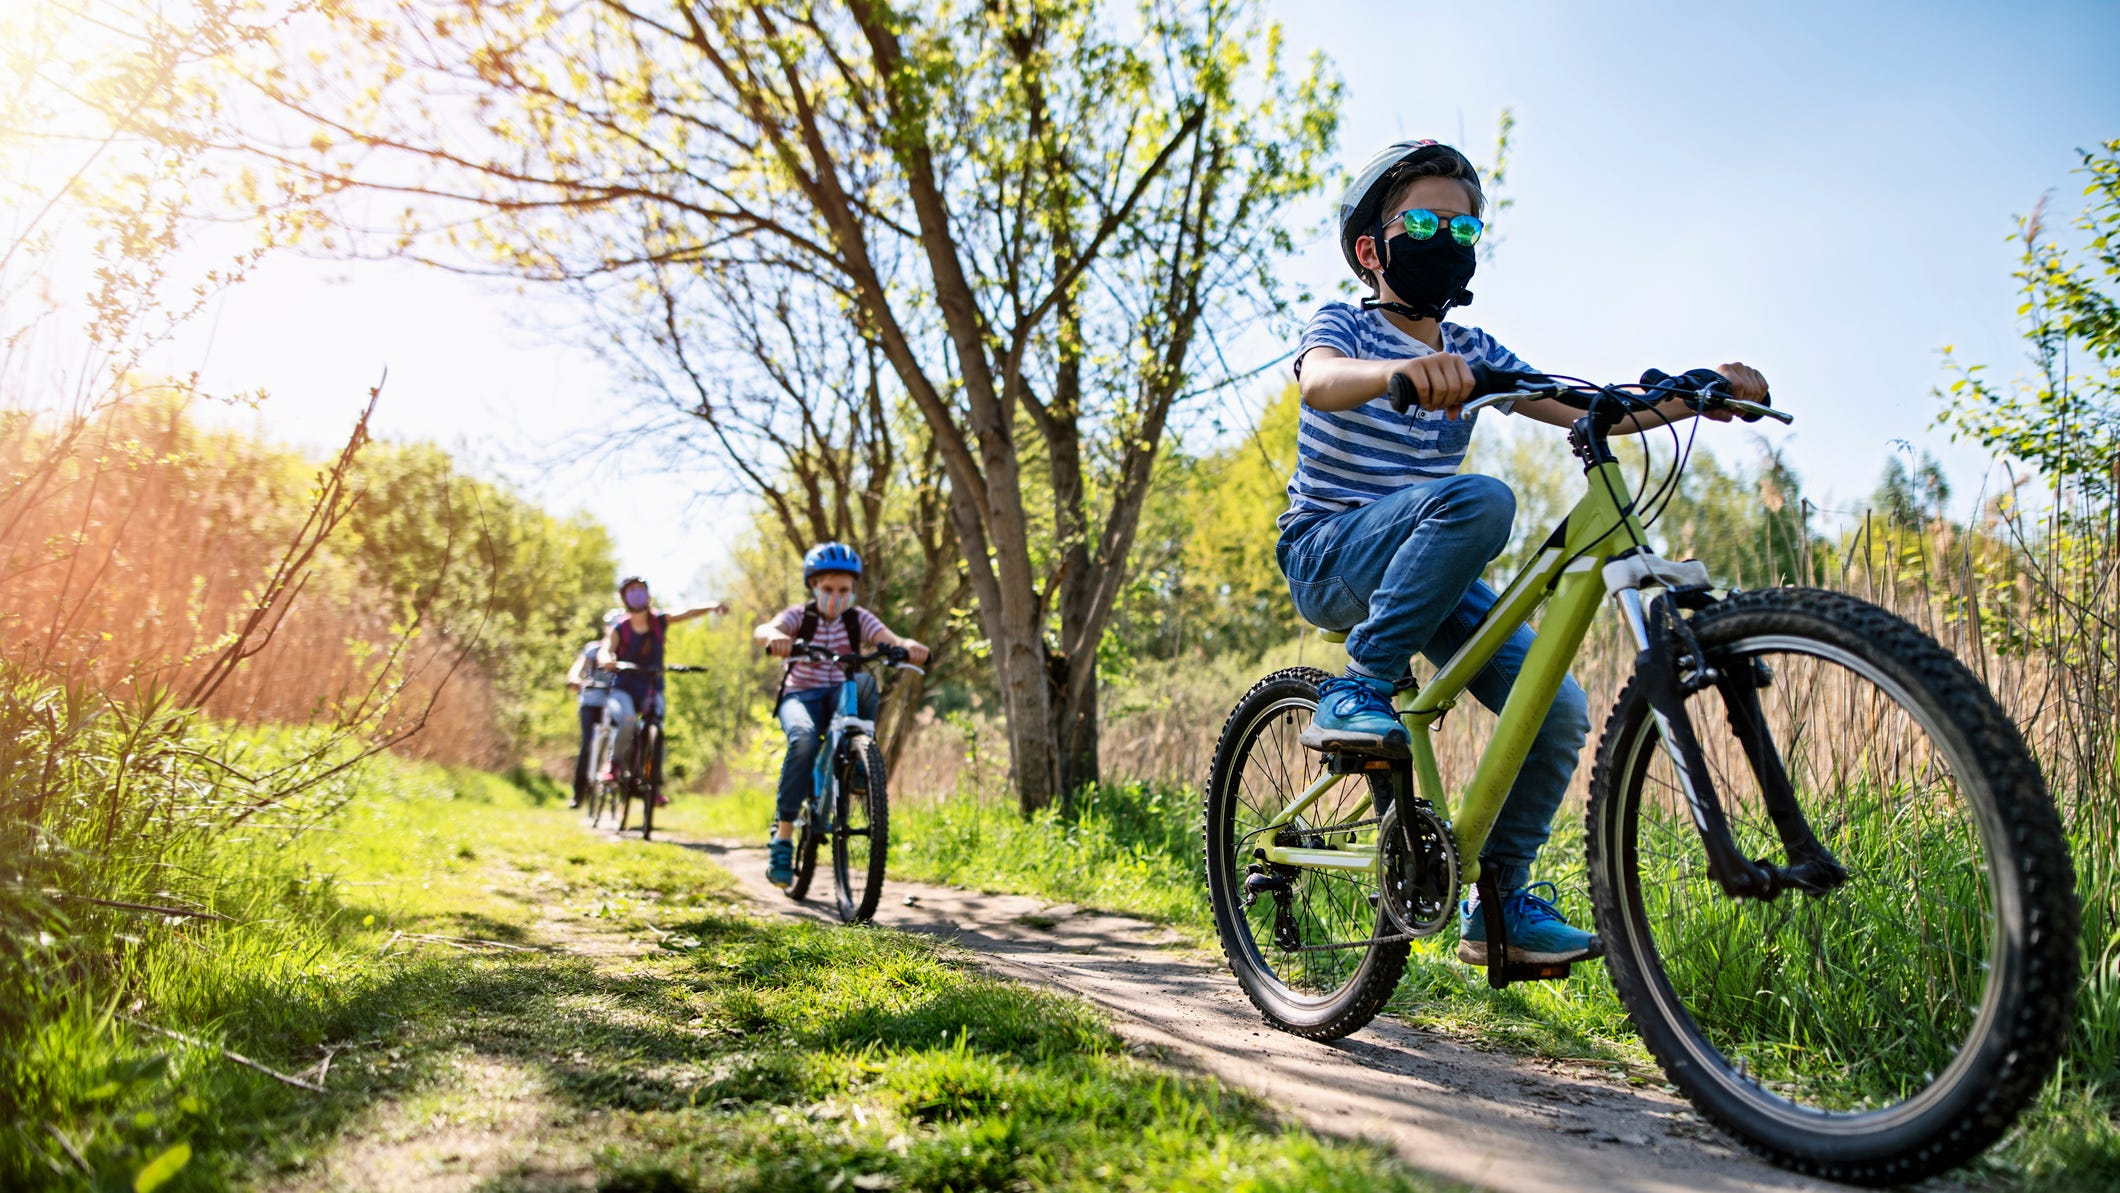 Coronavirus pandemic gives bike trails, rides new momentum